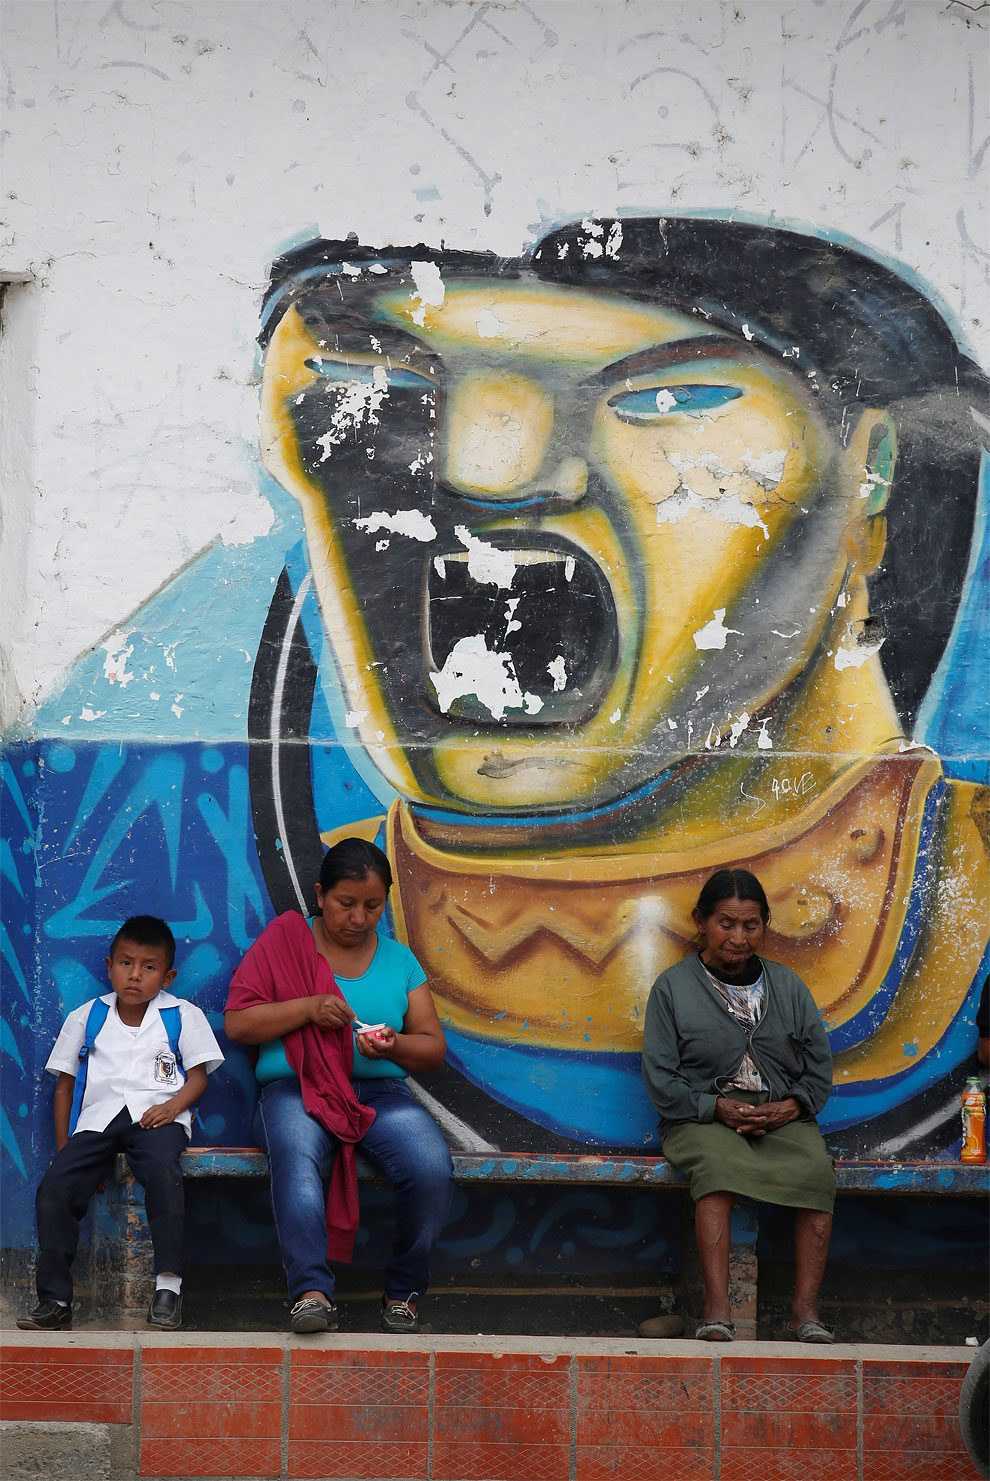 street-art-popolo-contro-potere-23